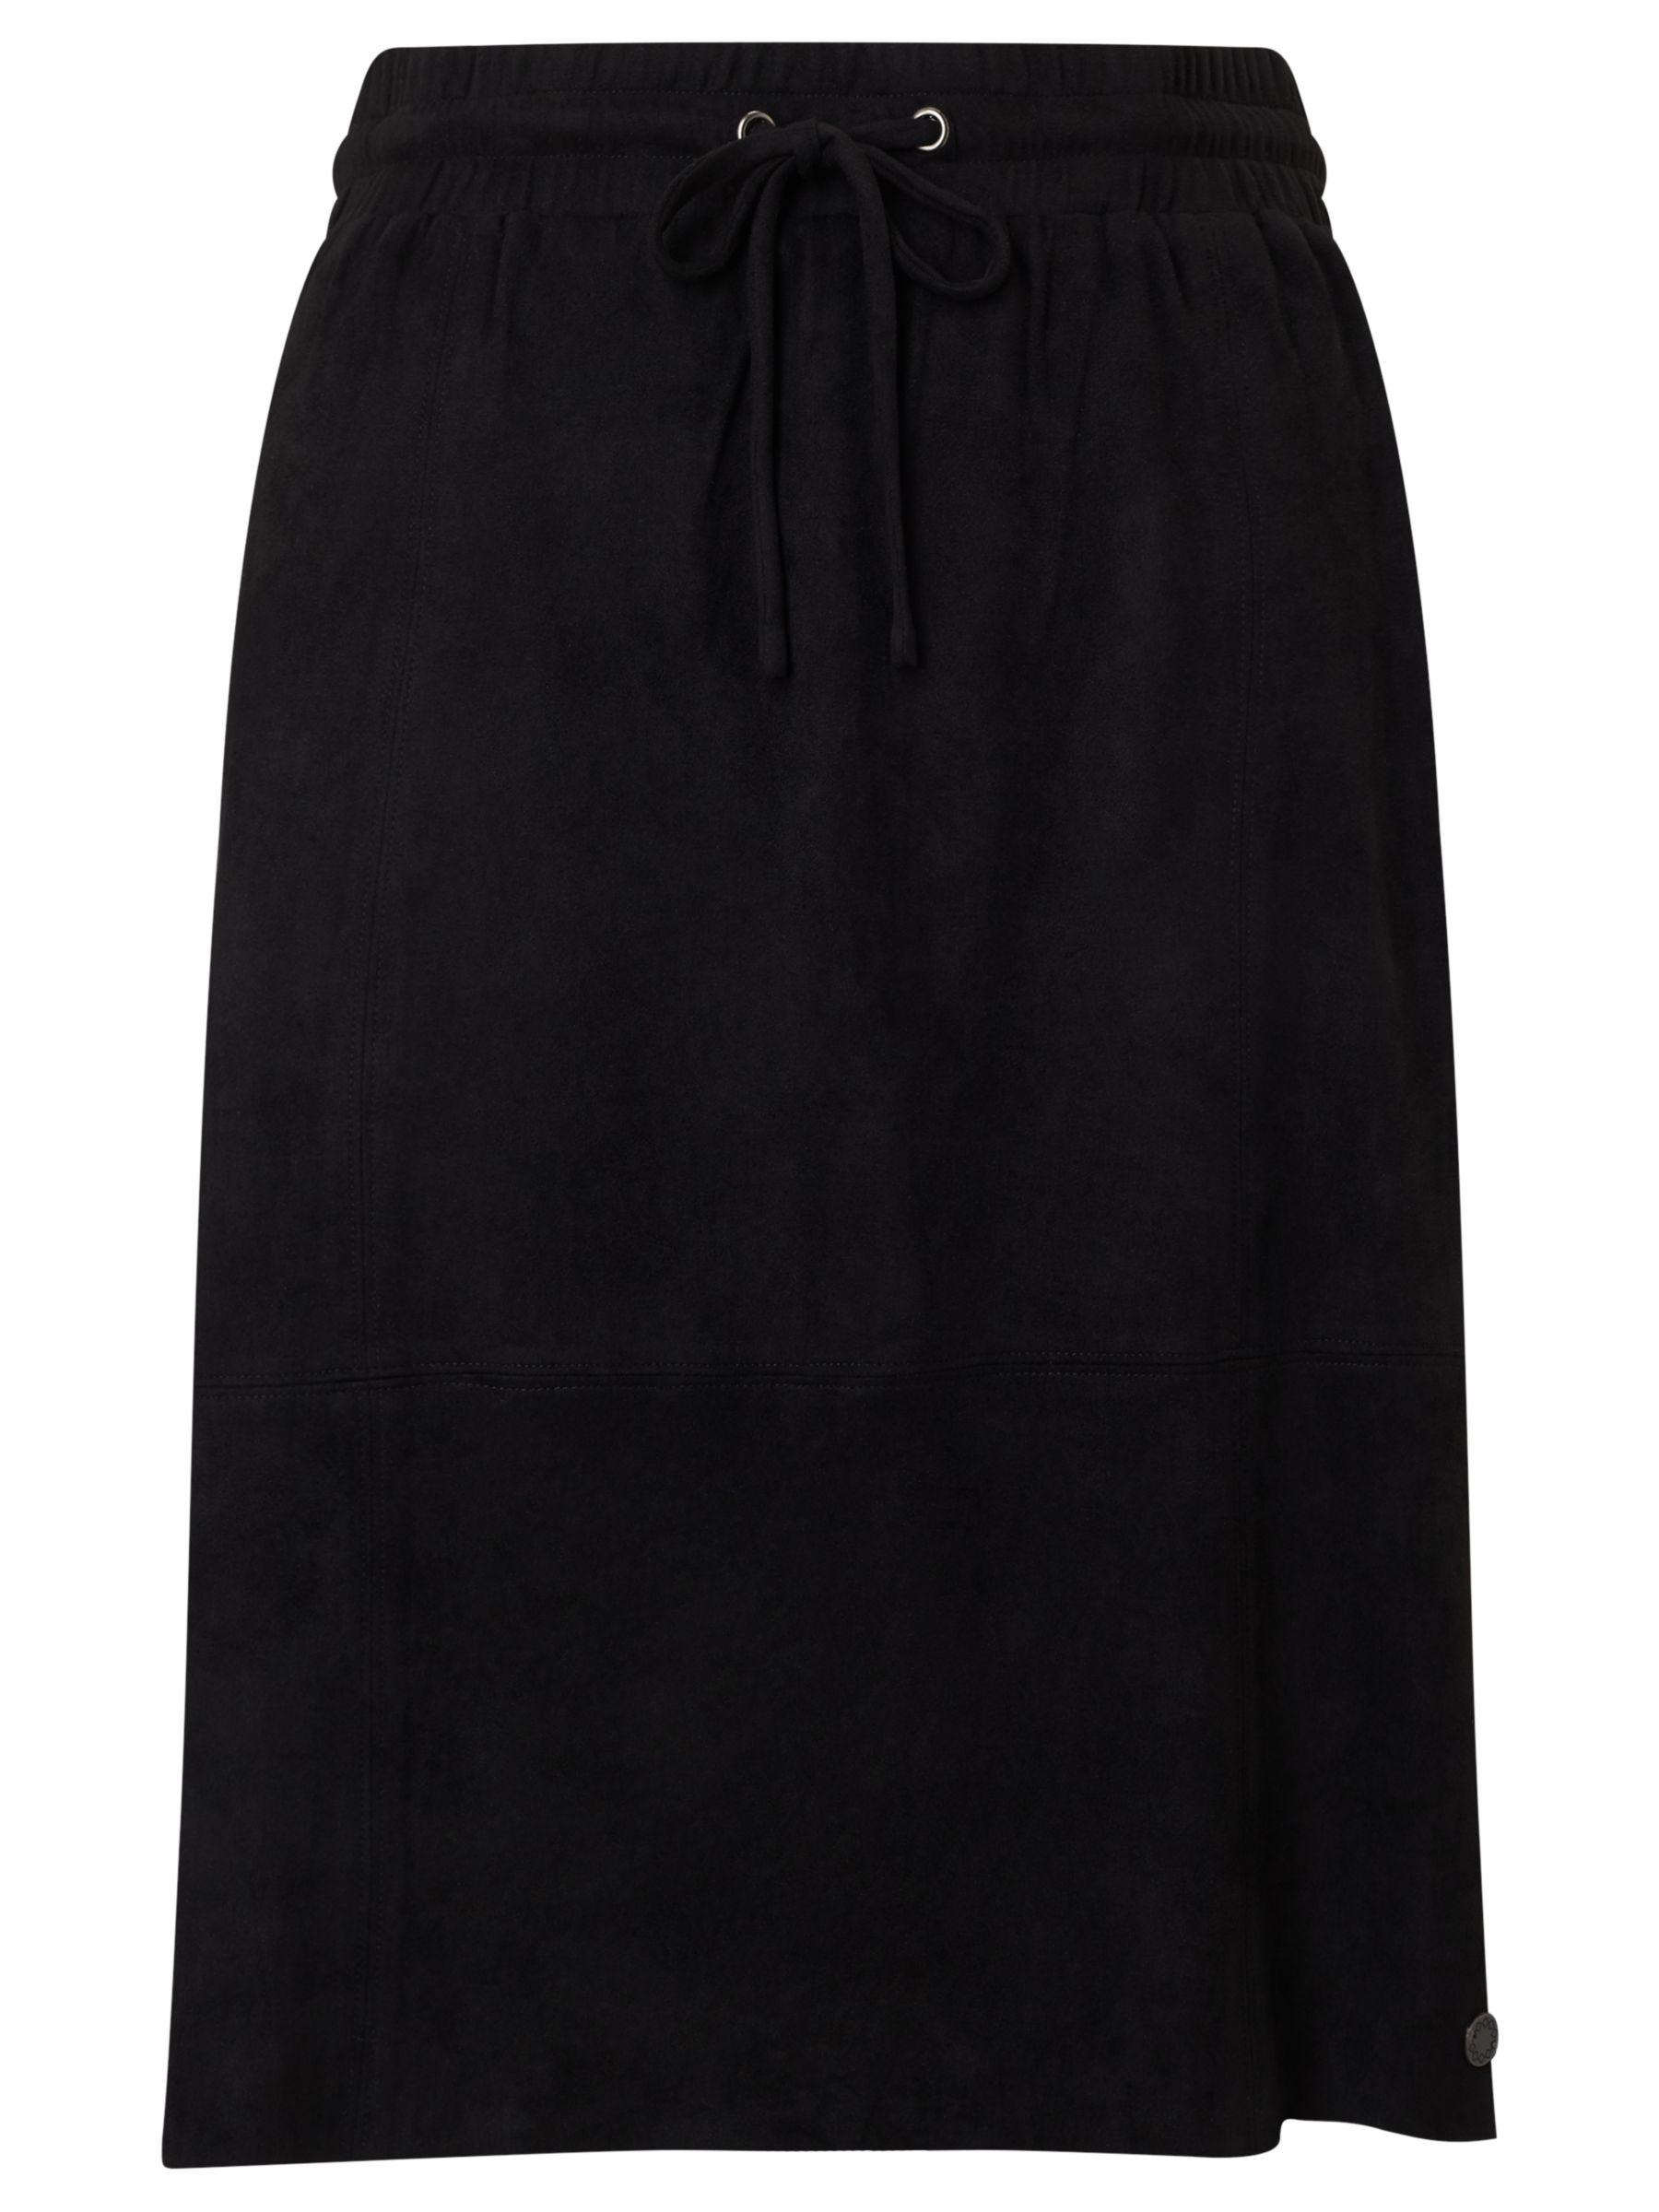 Numph Numph Bergdis Drawstring Skirt, Caviar